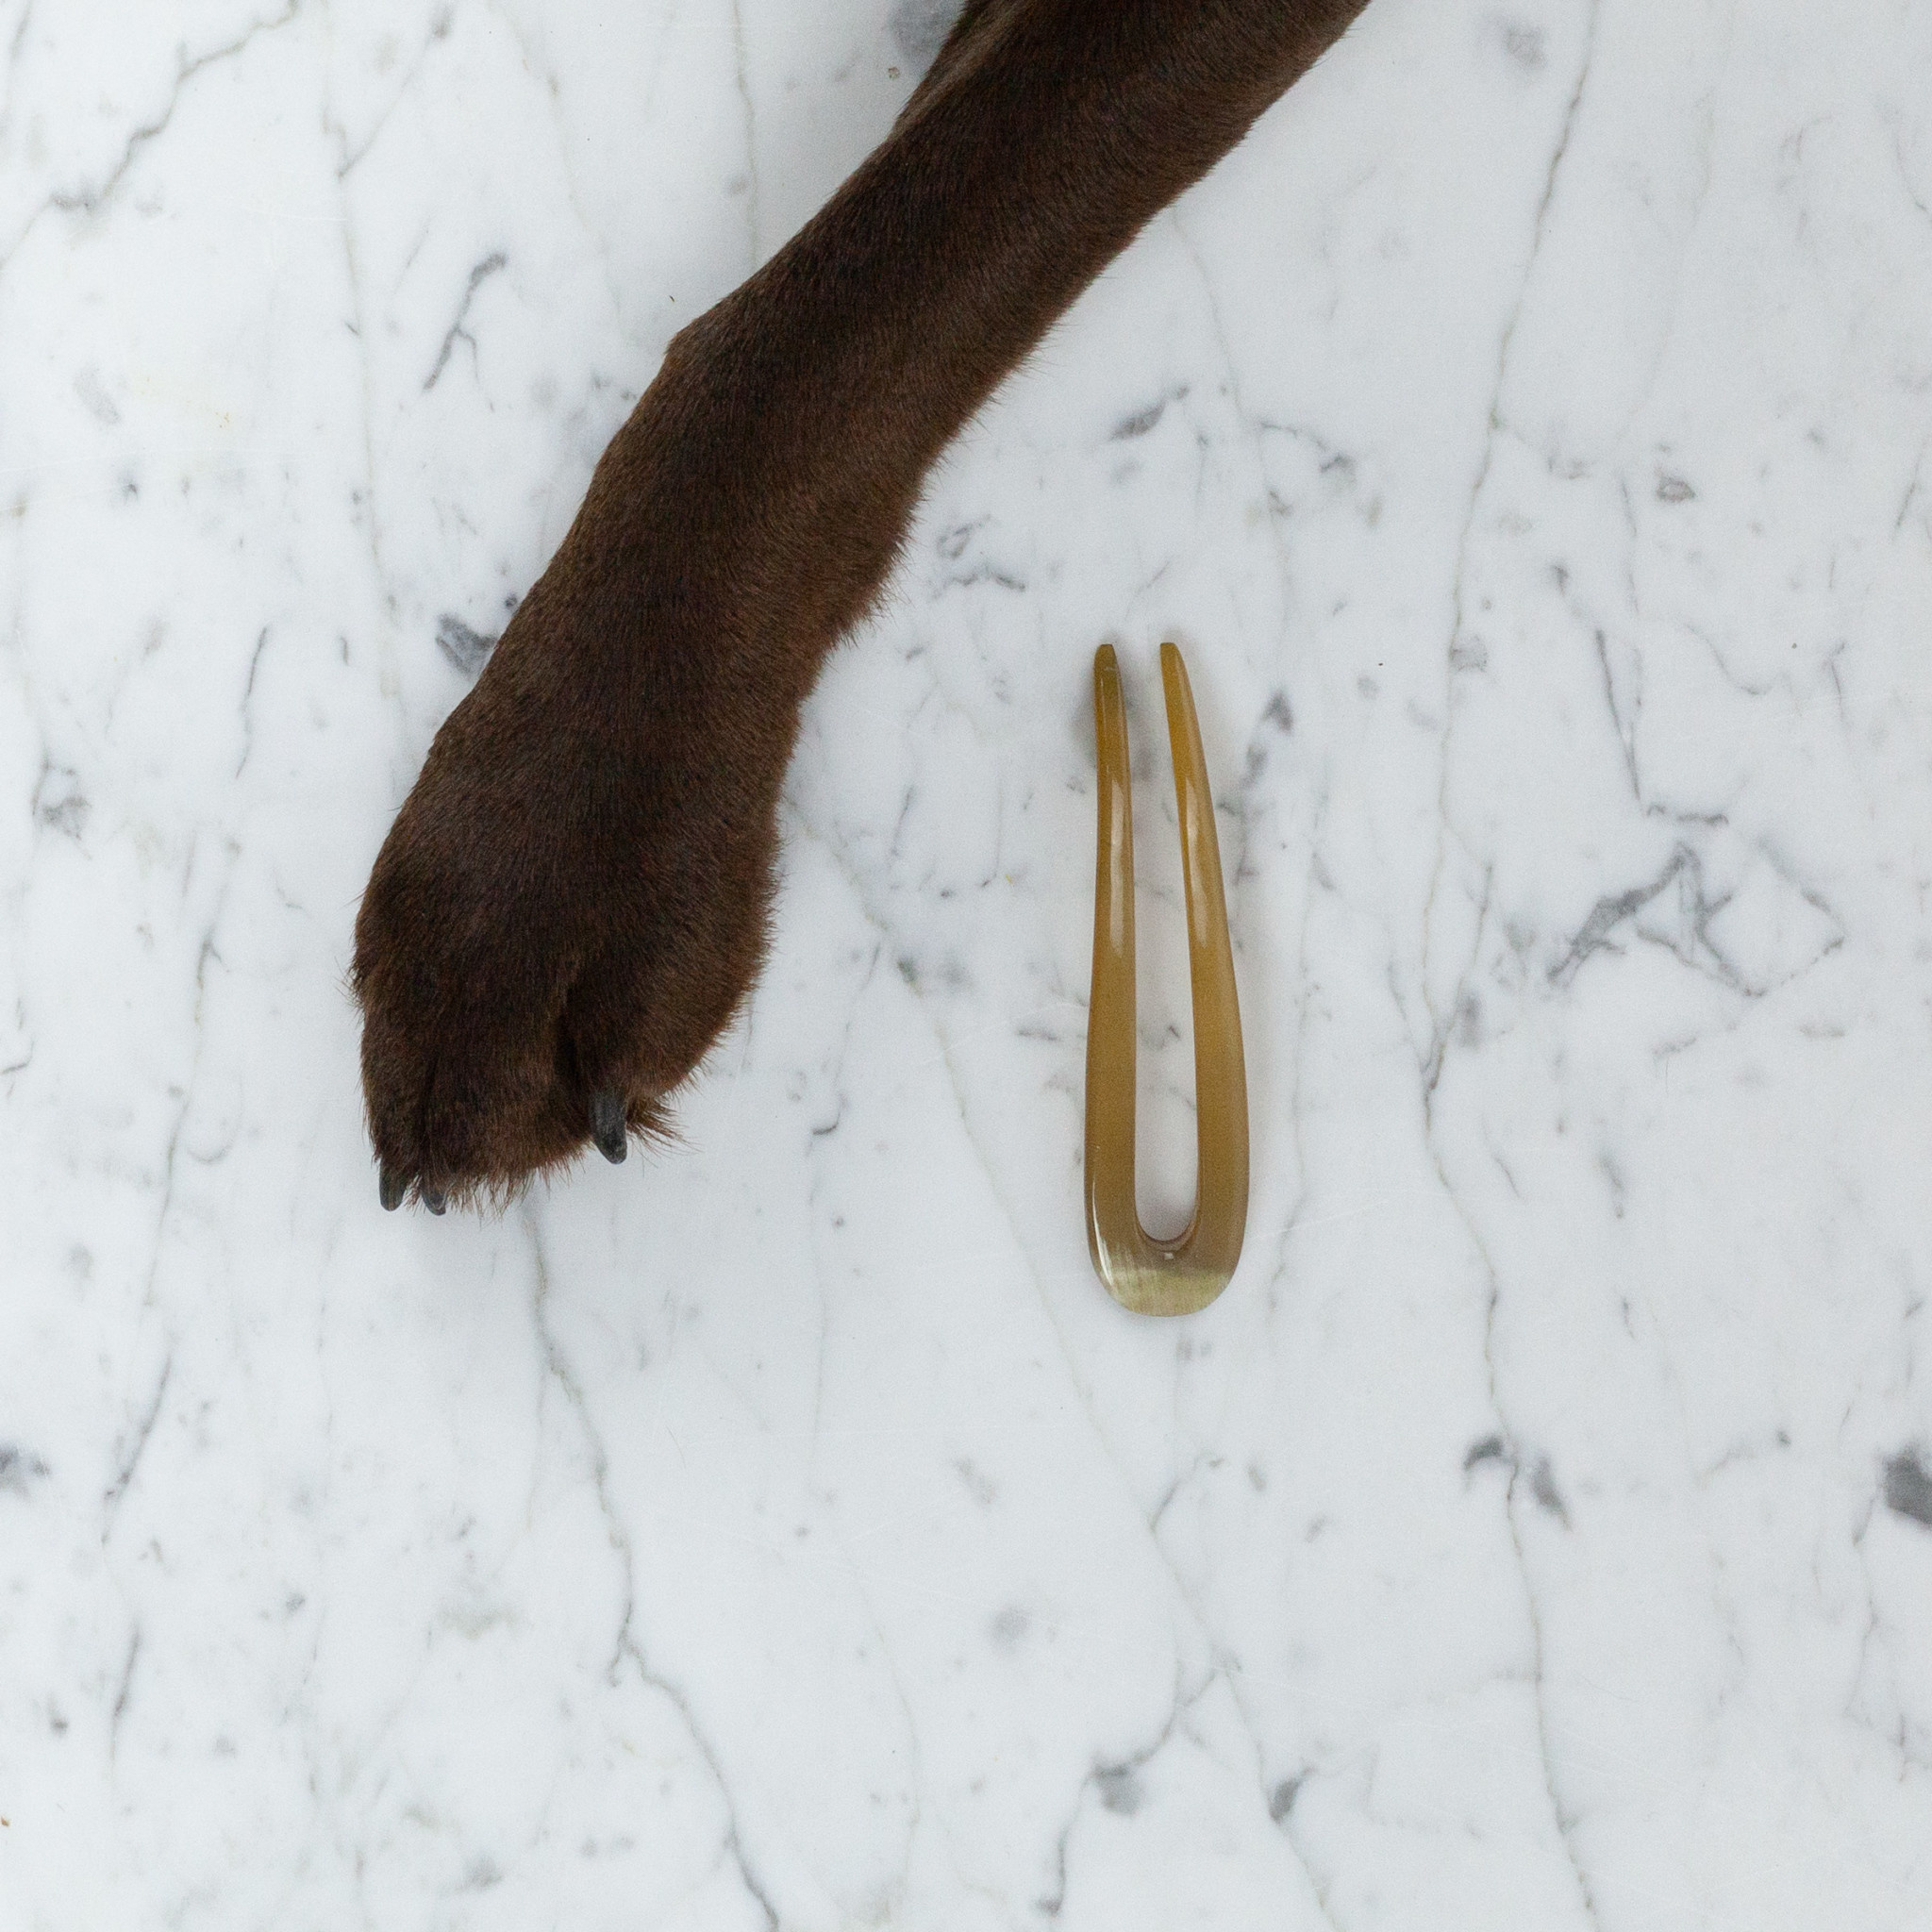 Danish Carved Horn  U-Shaped Hair Pin